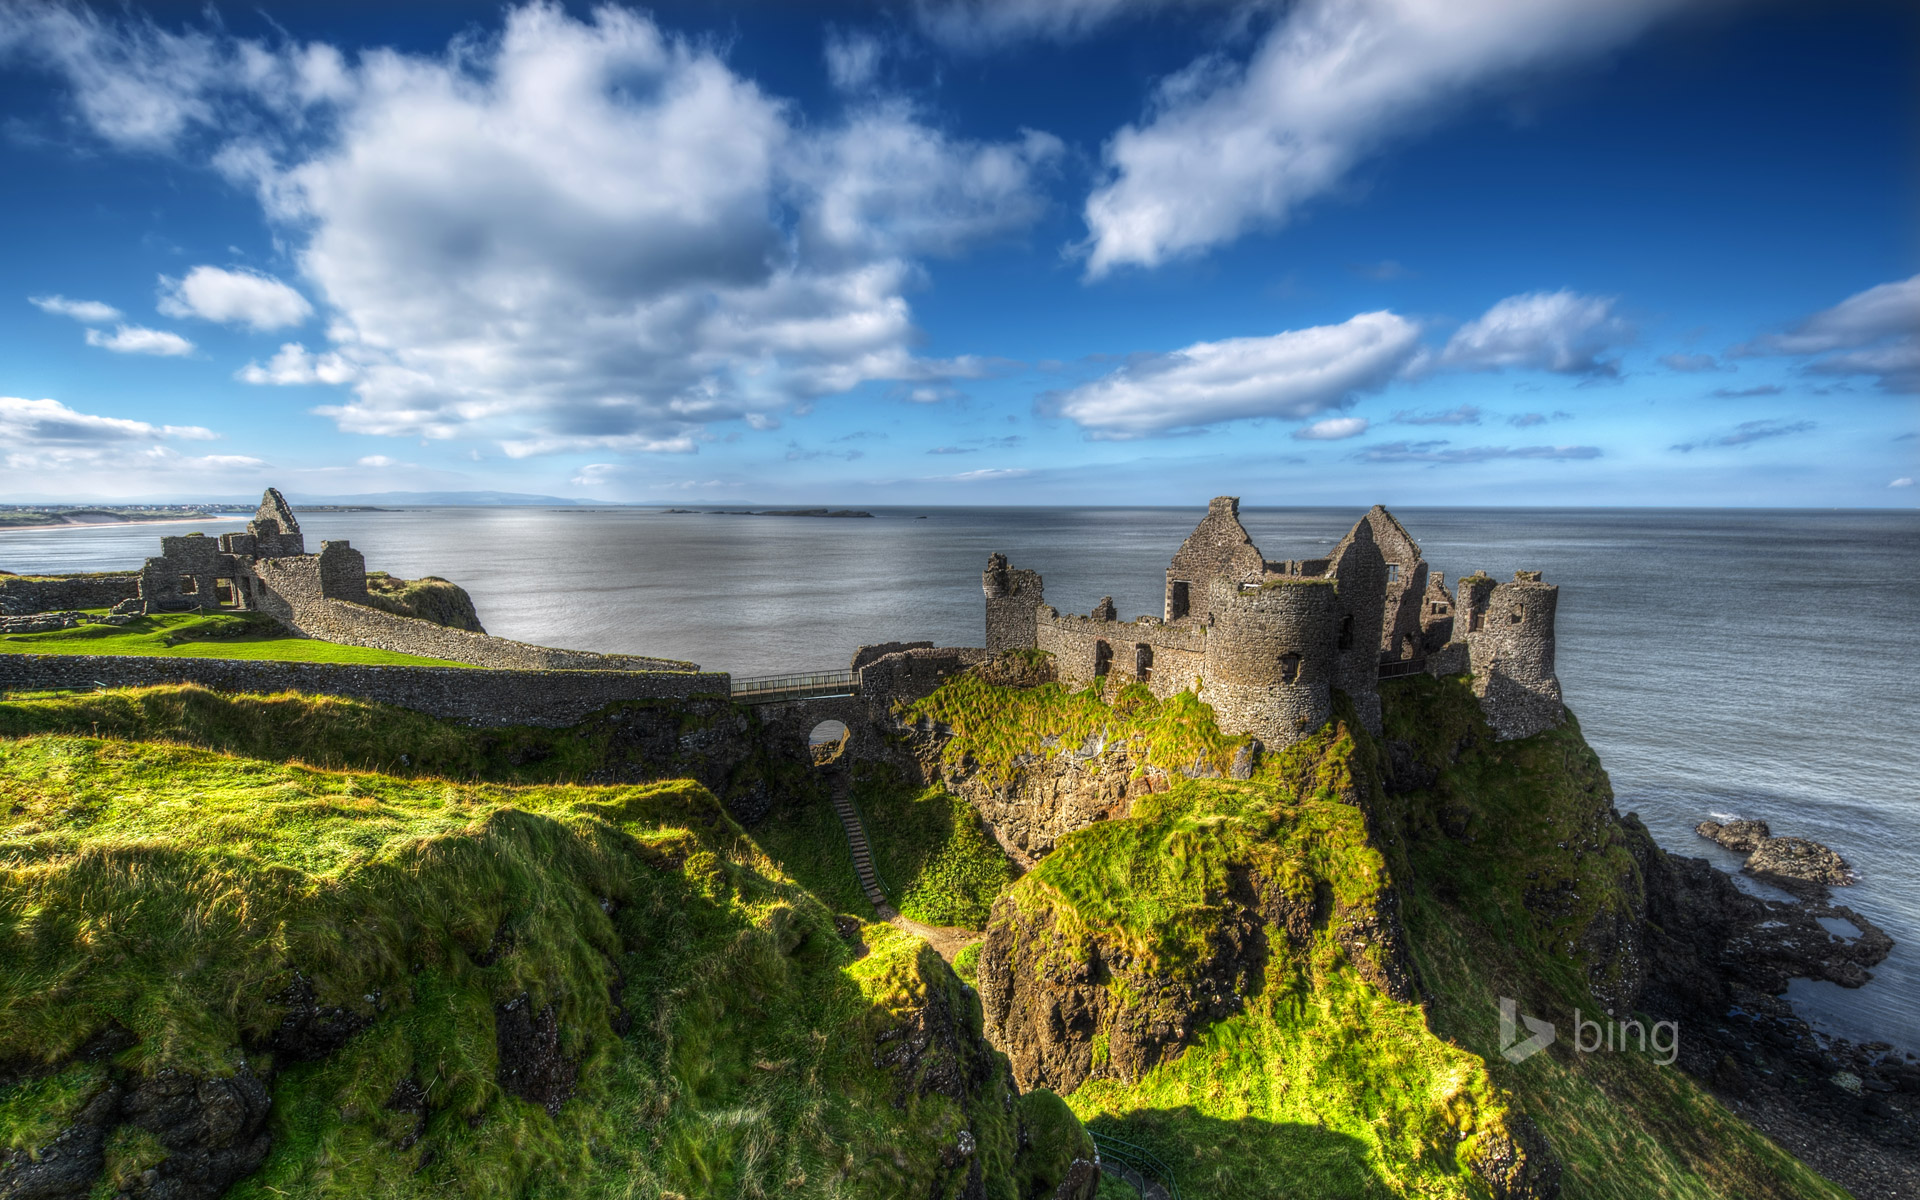 Dunluce Castle County Antrim Northern Ireland Gareth Wray 1920x1200